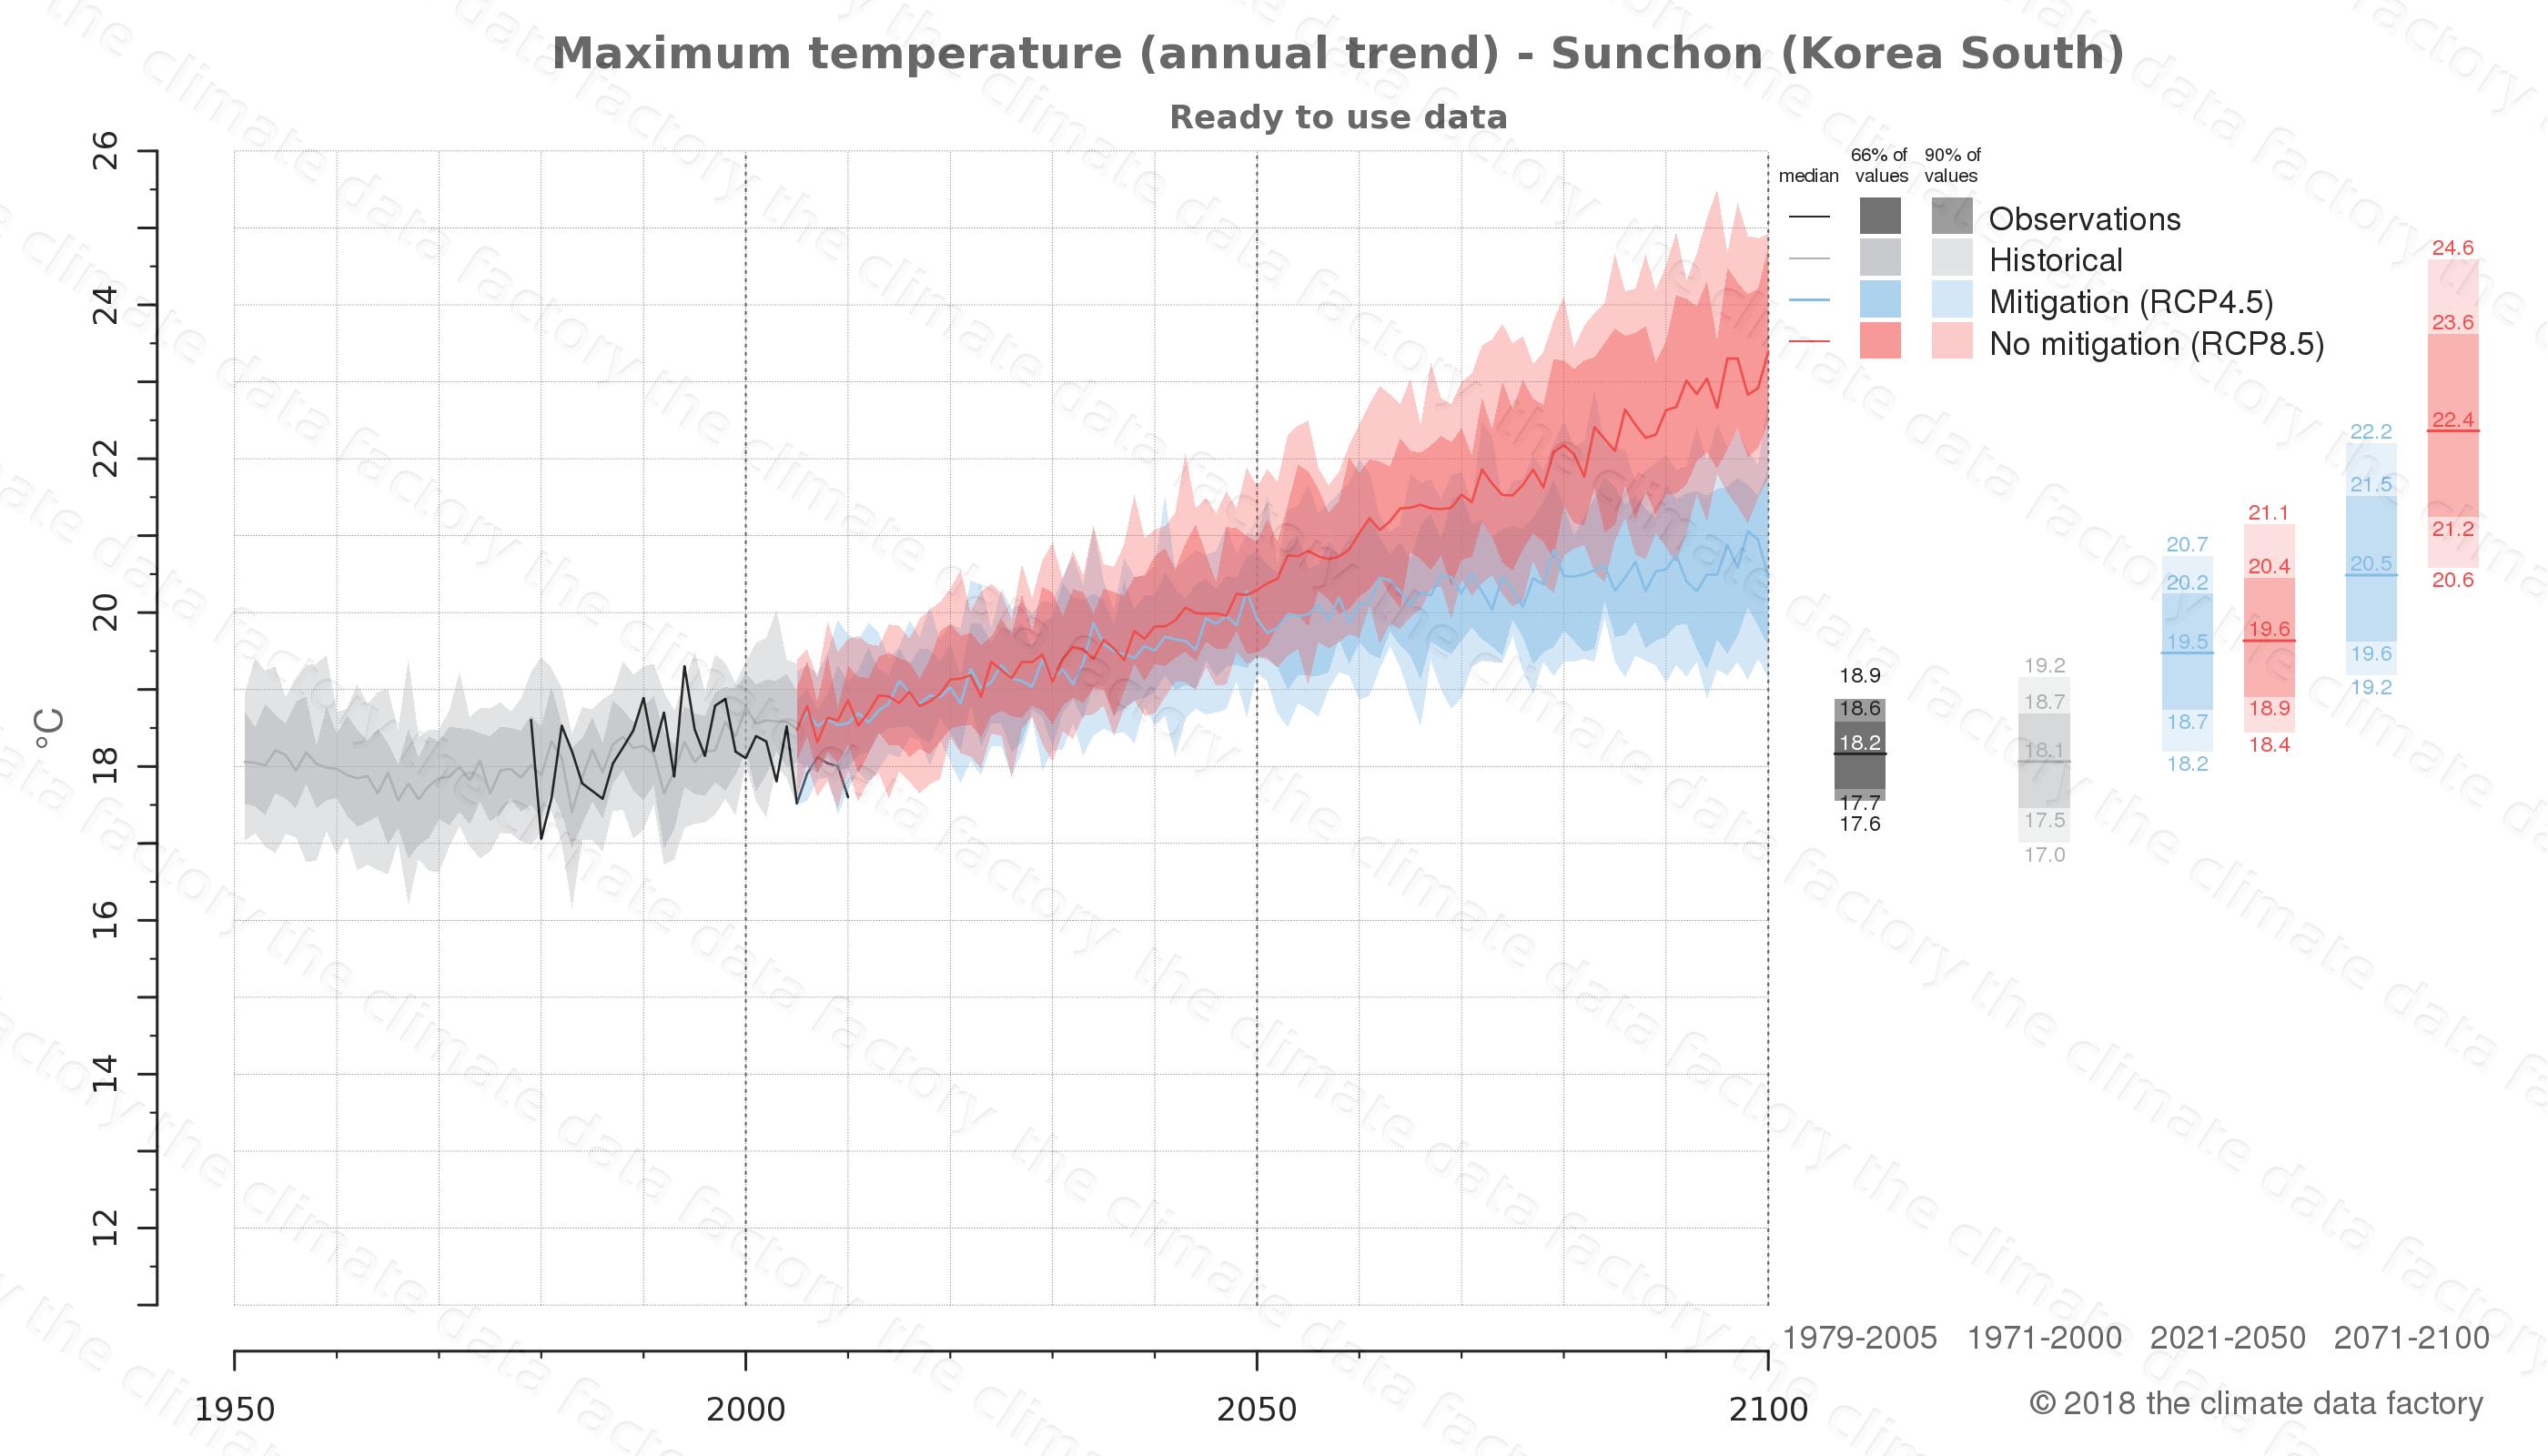 climate change data policy adaptation climate graph city data maximum-temperature sunchon south korea